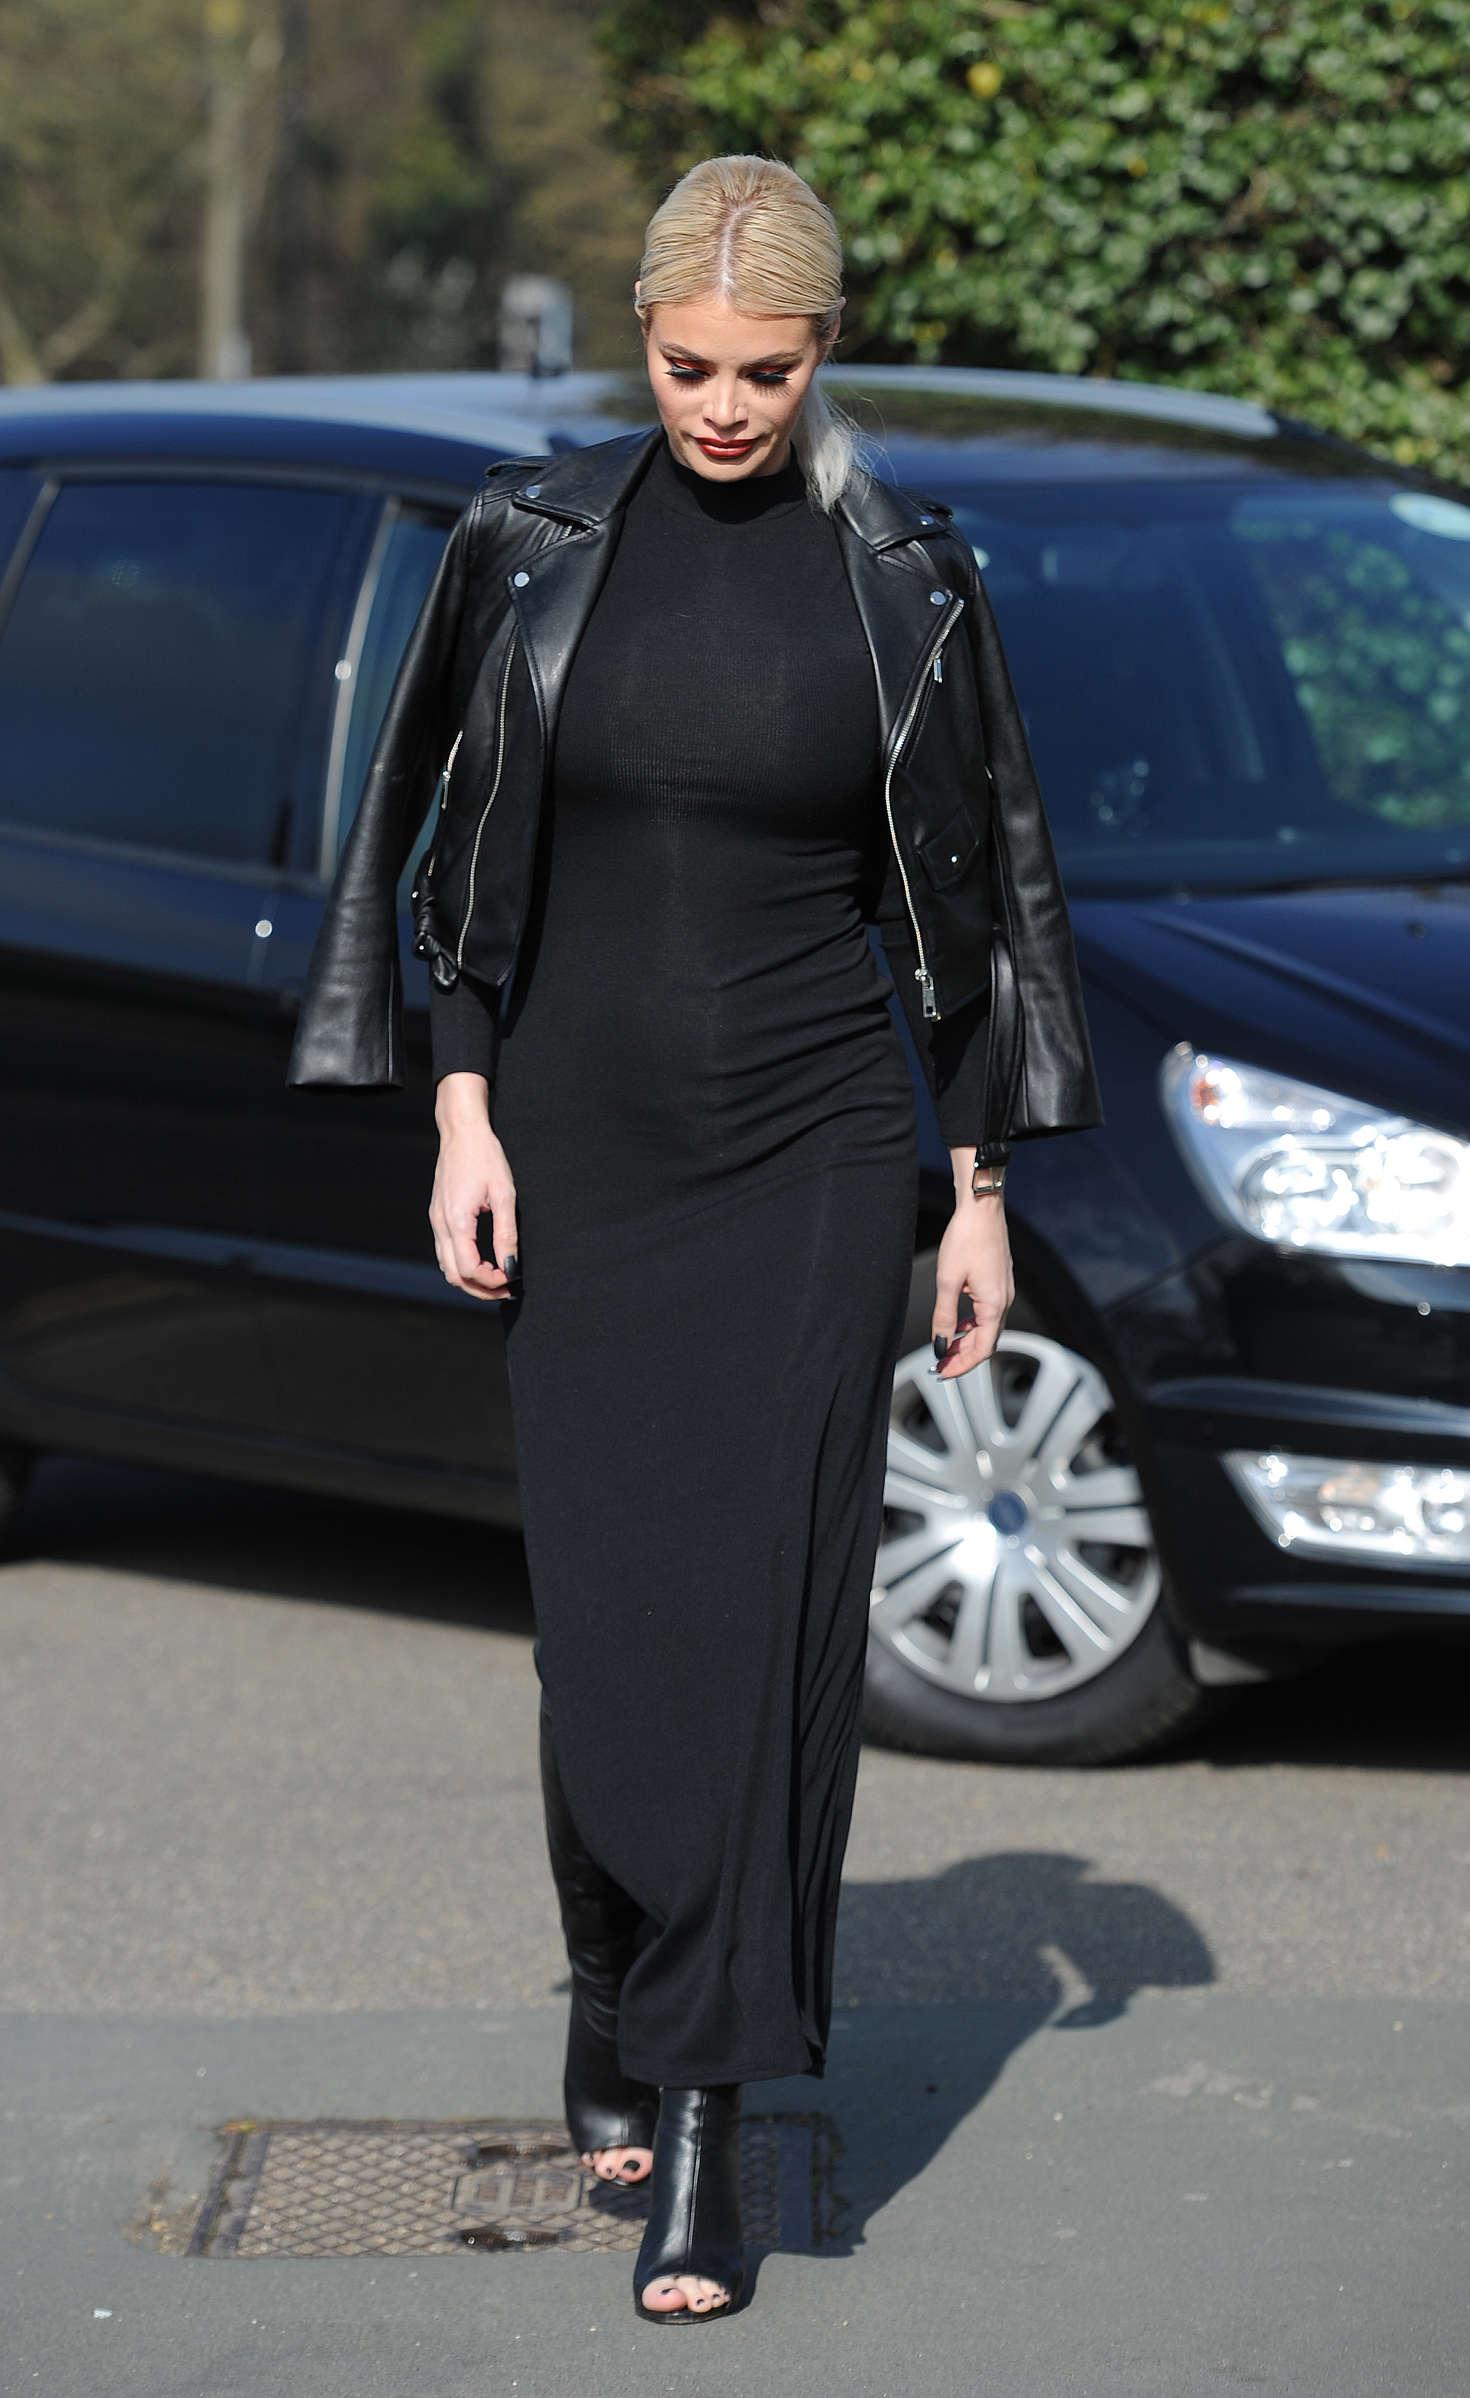 Chloe Sims Heads to fashion show in Danbury